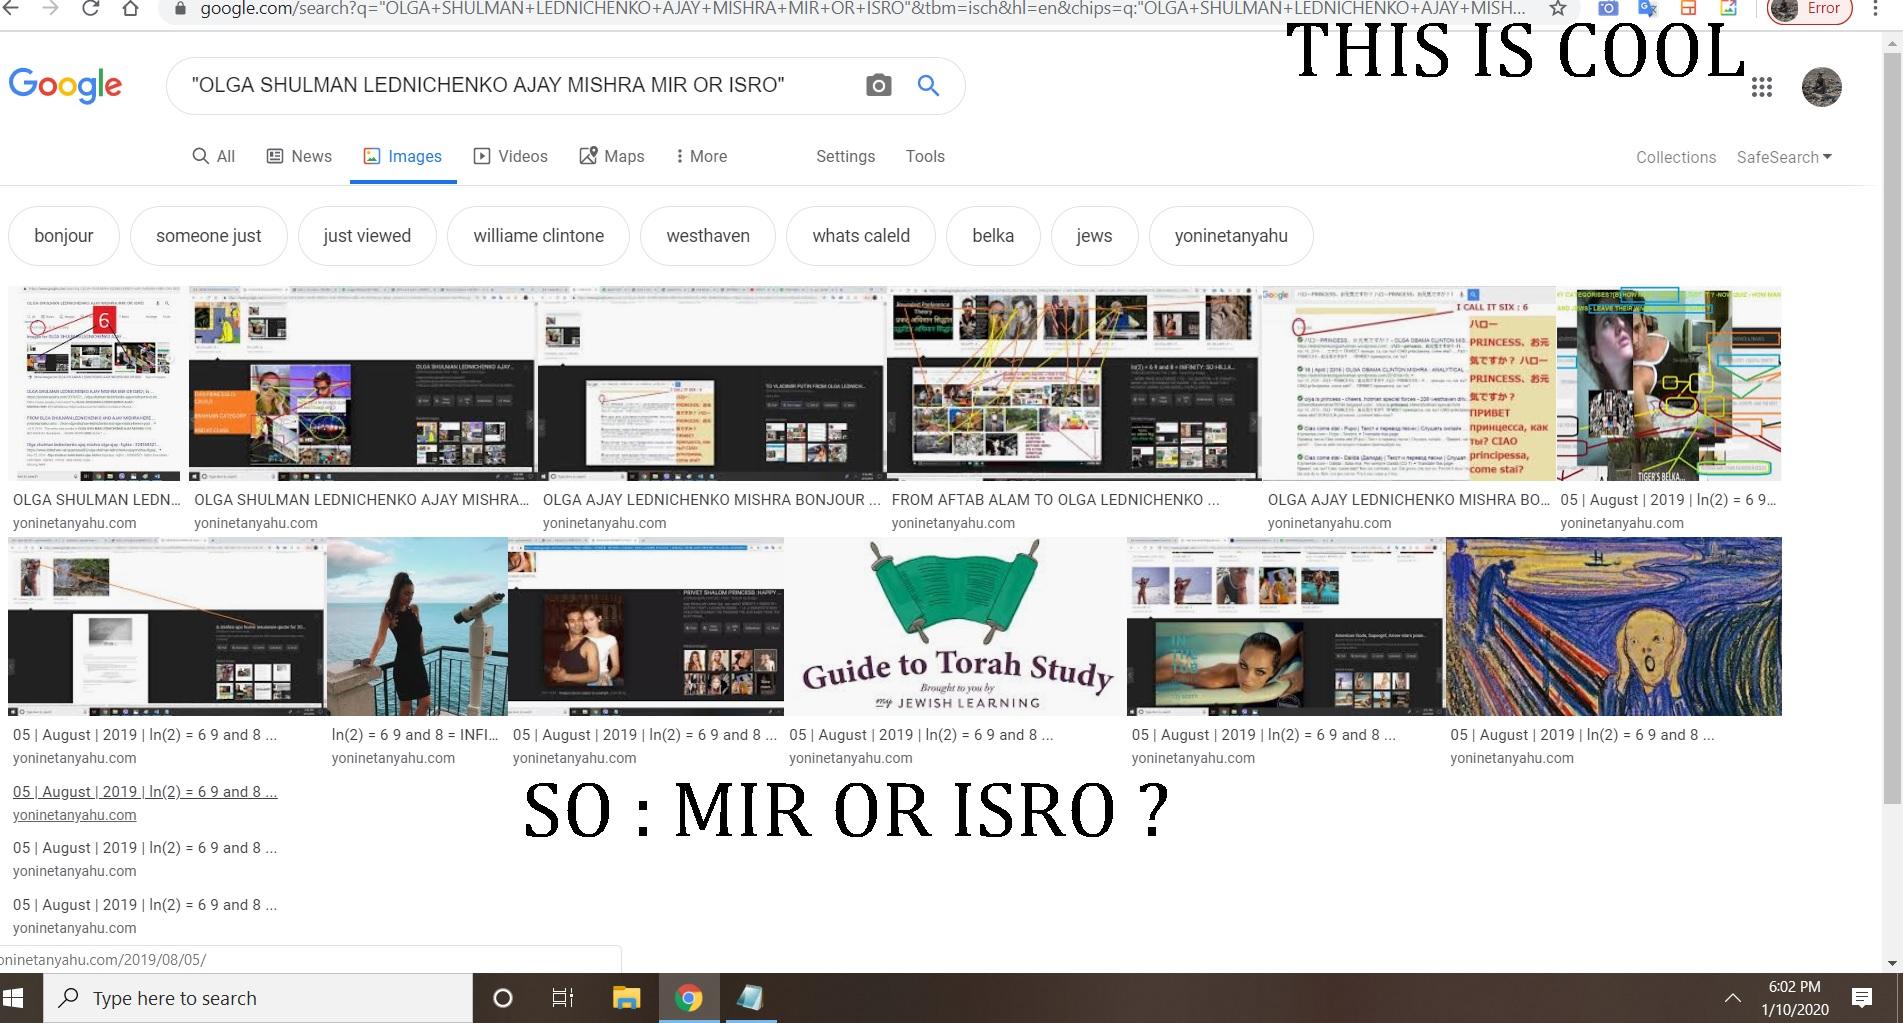 OLGA SHULMAN LEDNICHENKO AJAY MISHRA MIR OR ISRO